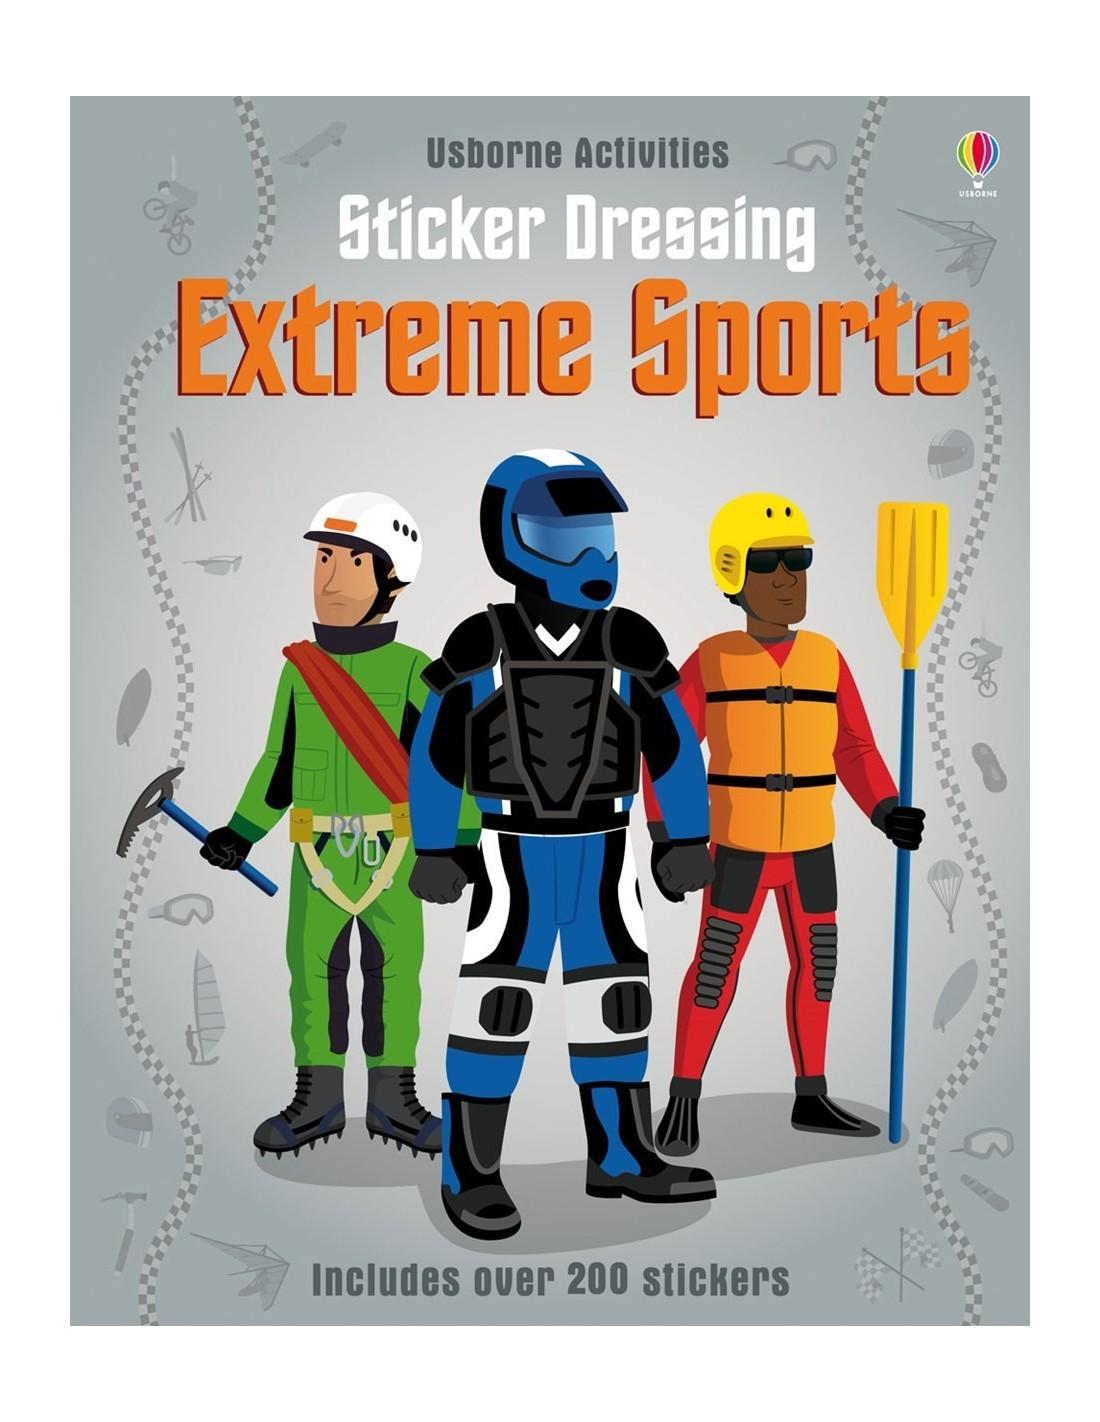 Sticker Dressing Extreme sports